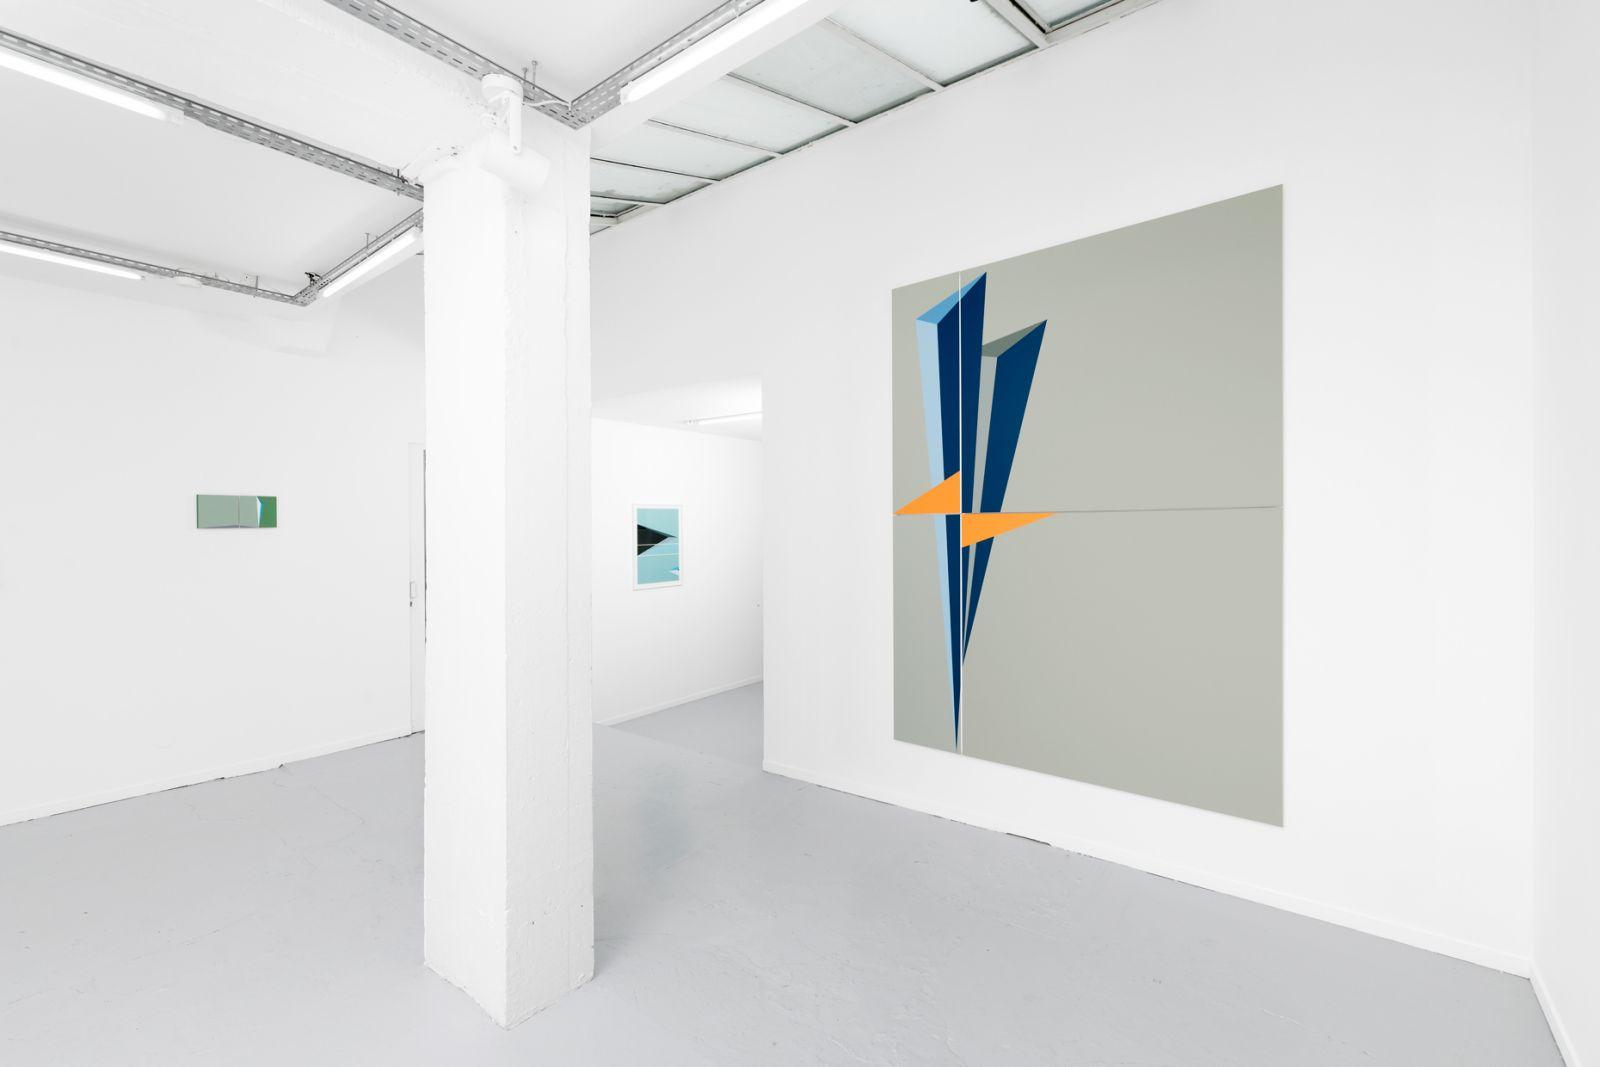 00-parties-fines-progress-gallery-vue-expo-3-aurelien-mole-web-fd3097076f3489946e66de52cde50c92